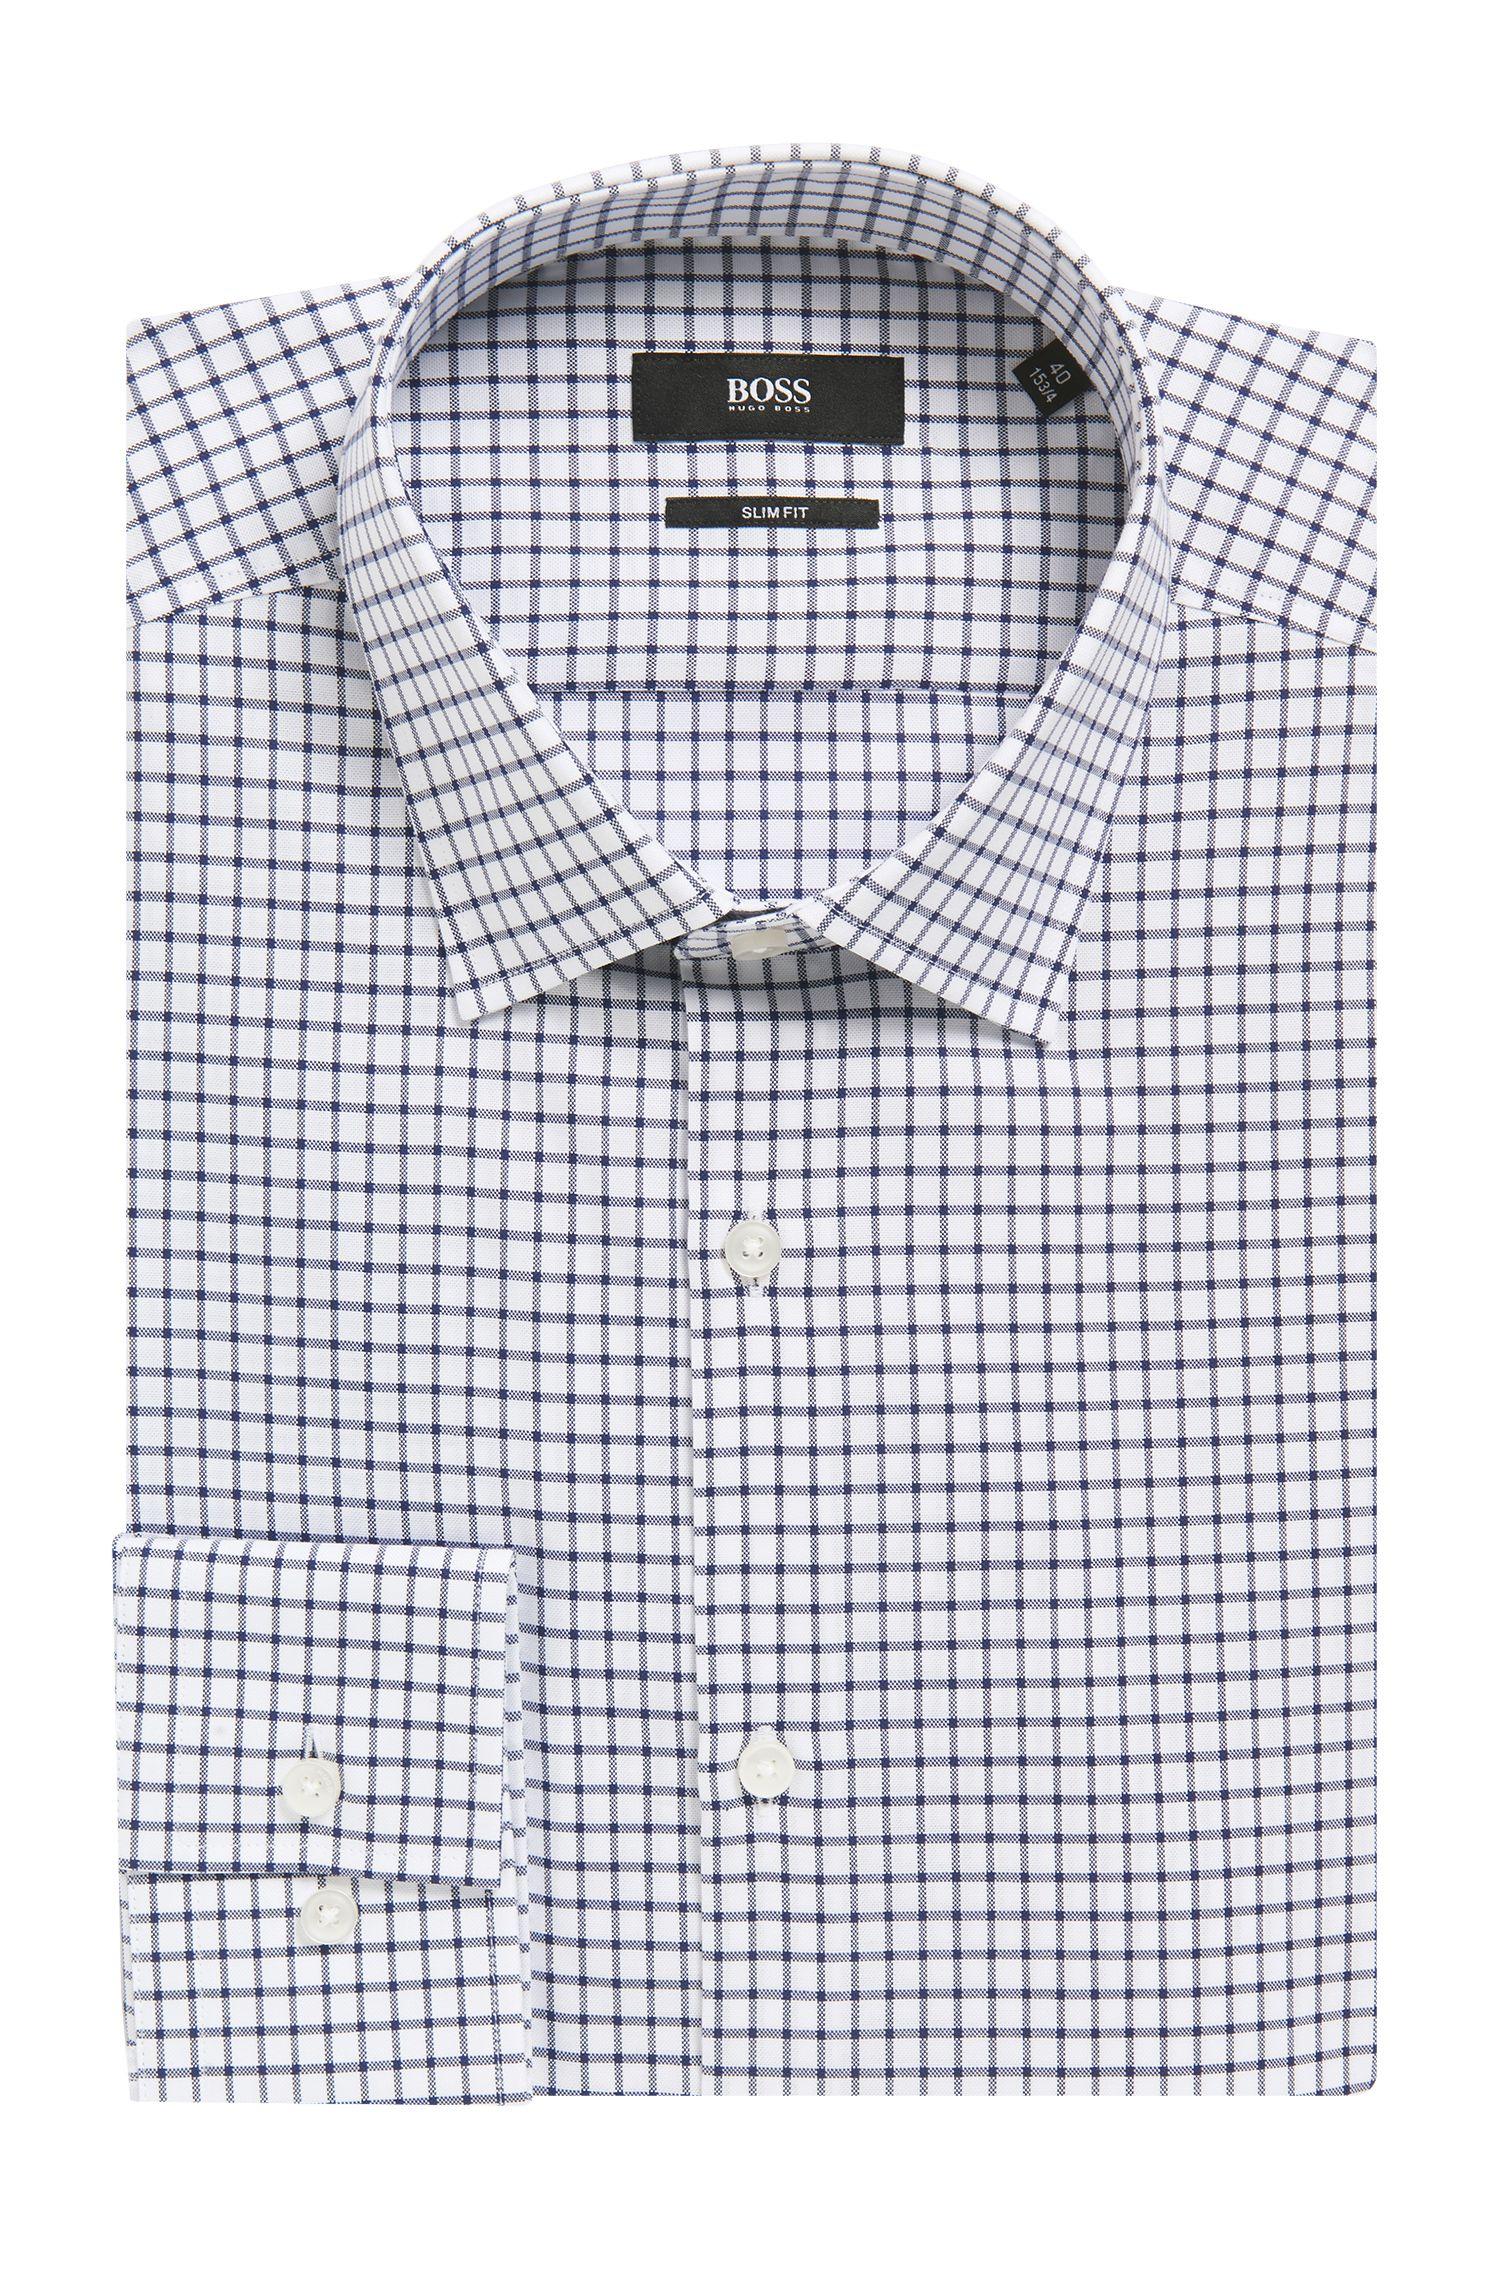 Grid Check Cotton Dress Shirt, Slim Fit | Jenno